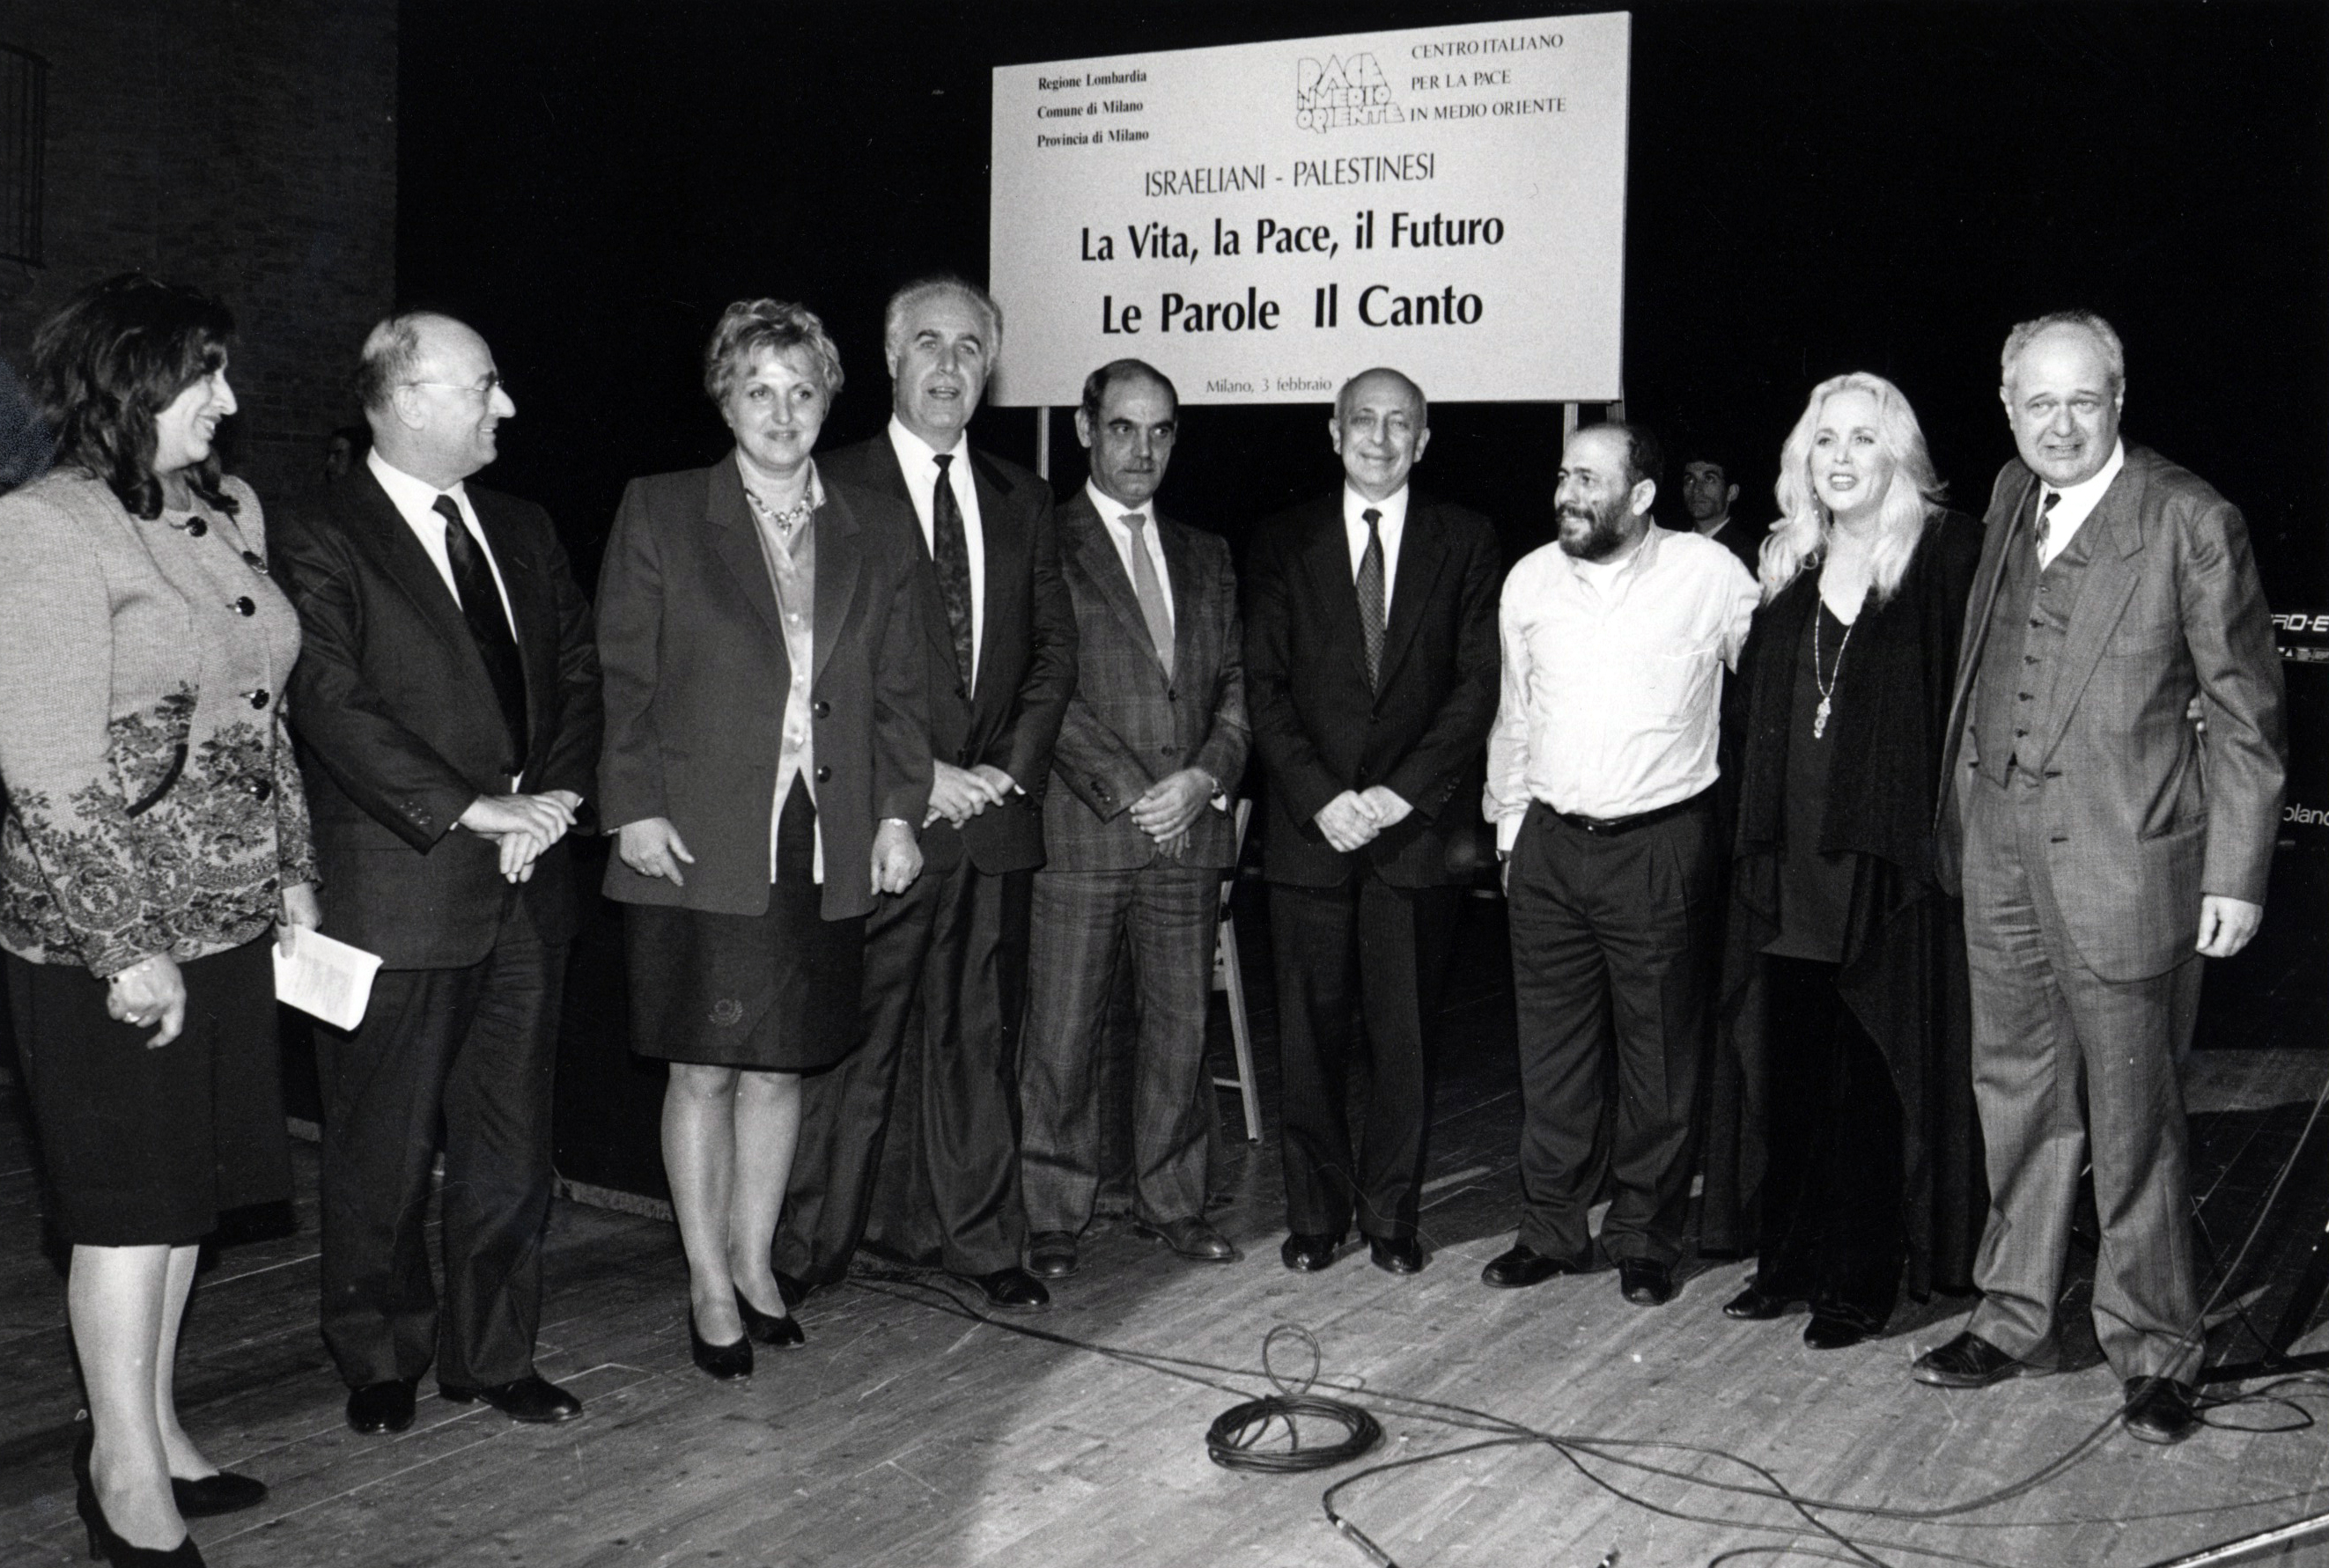 Da sinistra Livio Tamberi, Fiorella Ghilardotti, Samuel Tvet, Nemer Hammad, Avi Pazner, Mustafa Al-Kurd, Miri Aloni, Janiki Cingoli